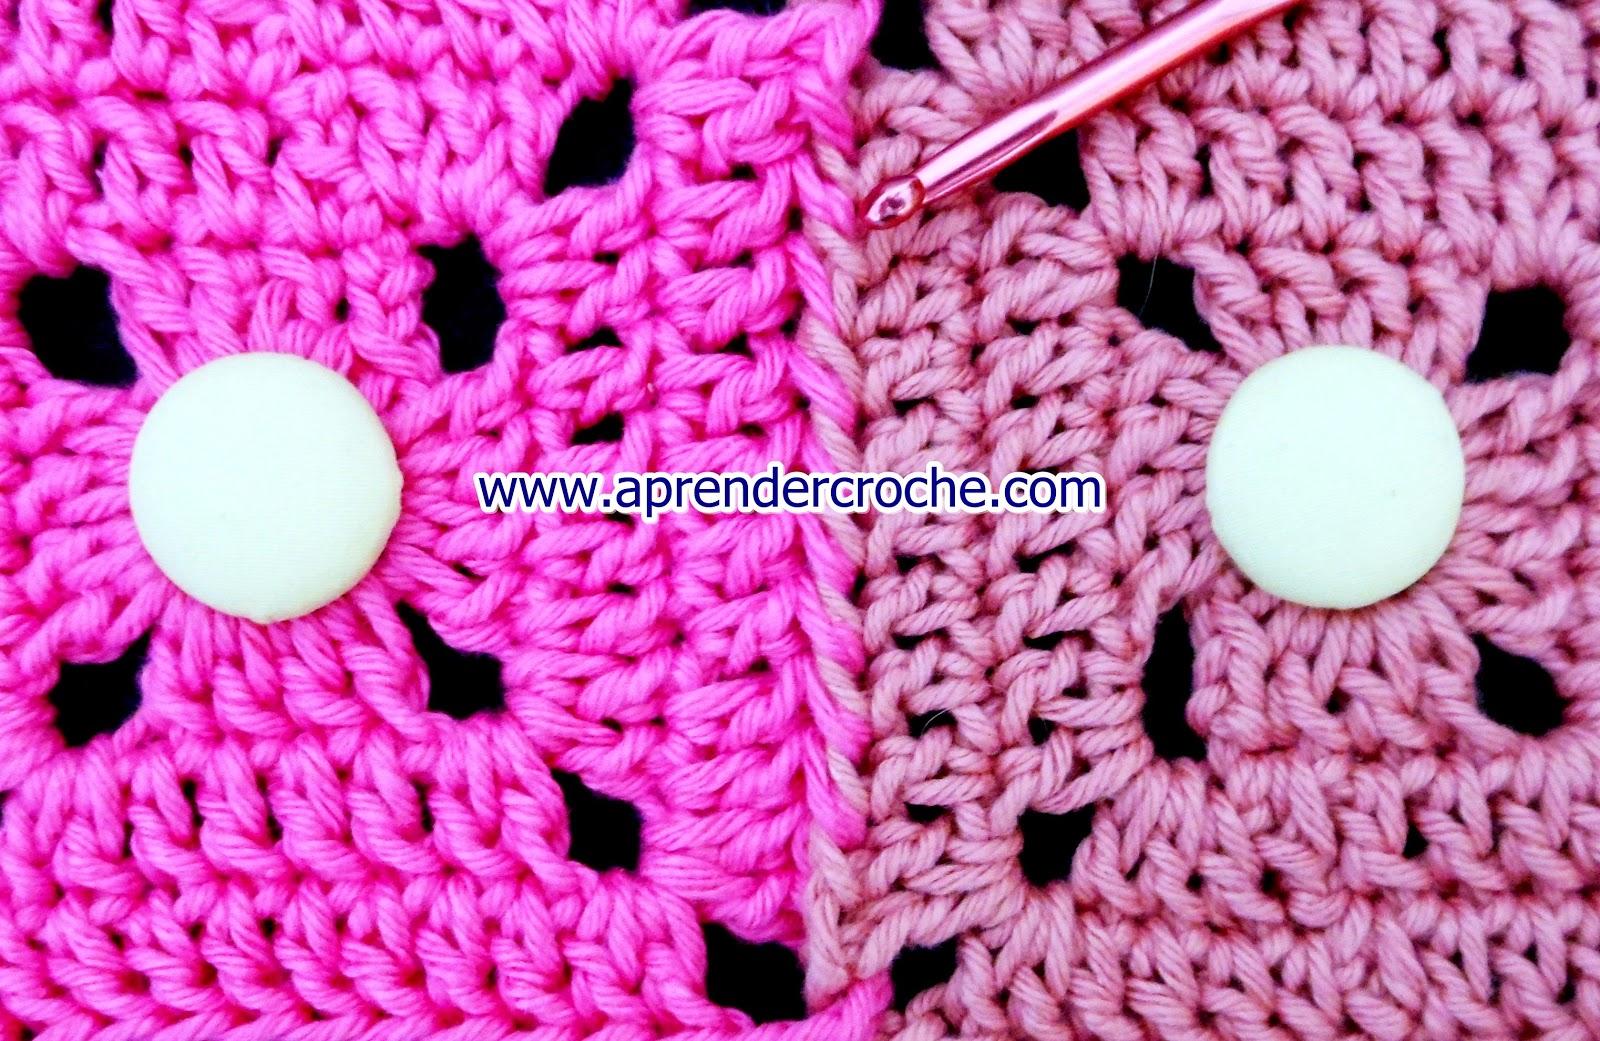 aprender croche quadrados square rosa emenda costura agulha crochet edinir-croche loja dvd frete gratis facebook youtube